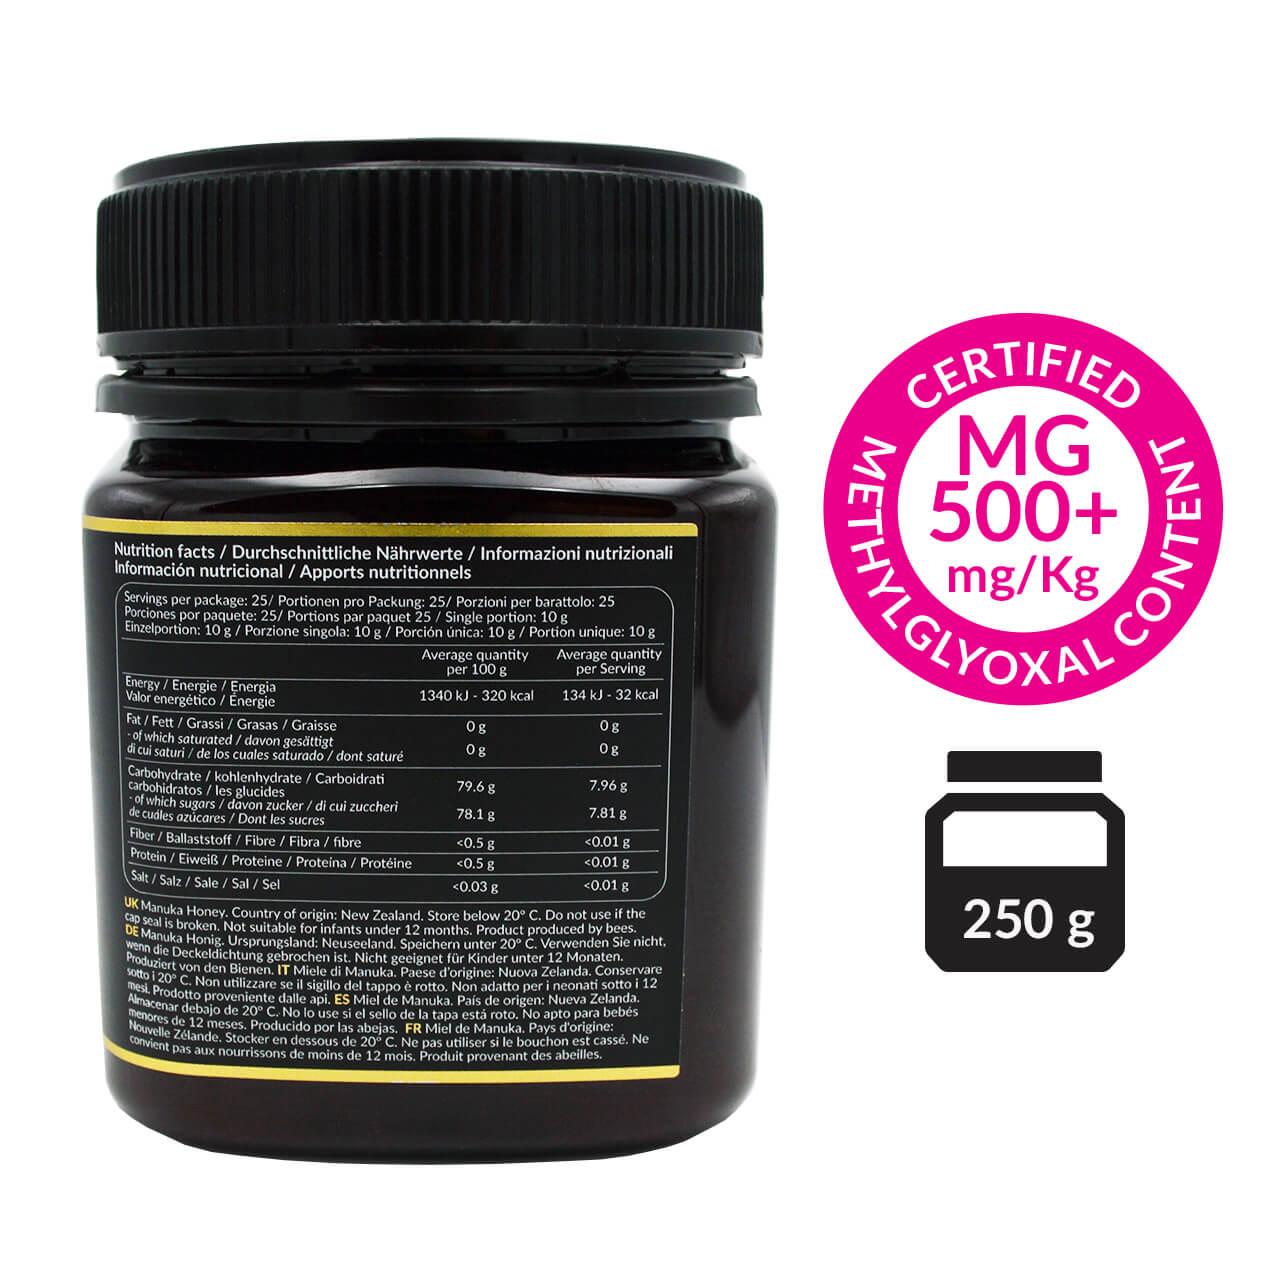 Manuka Honey de Nueva Zelanda